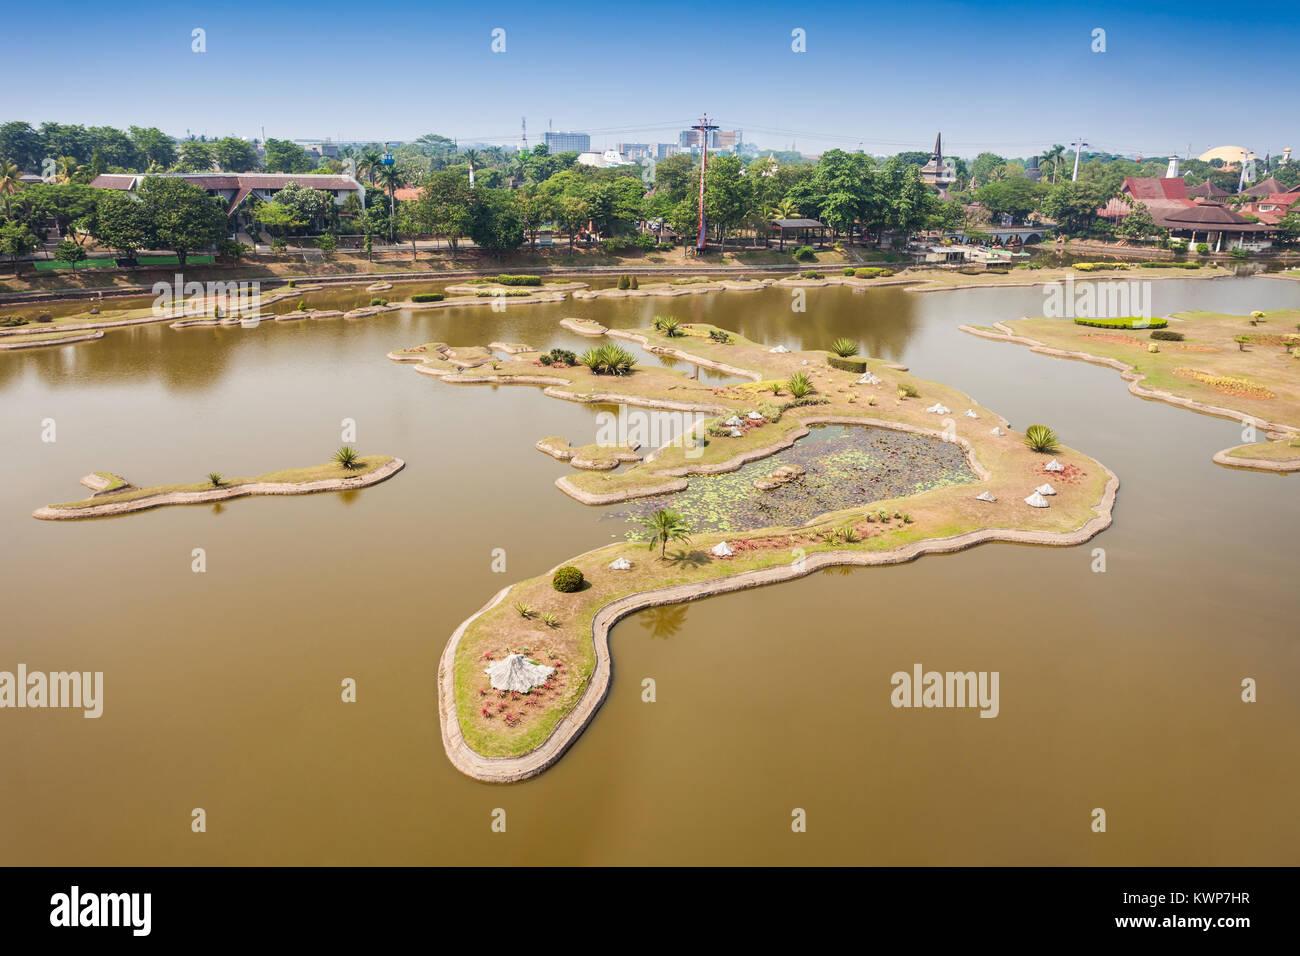 The miniature of Indonesian Archipelago in the Taman Mini Indonesia Park. - Stock Image